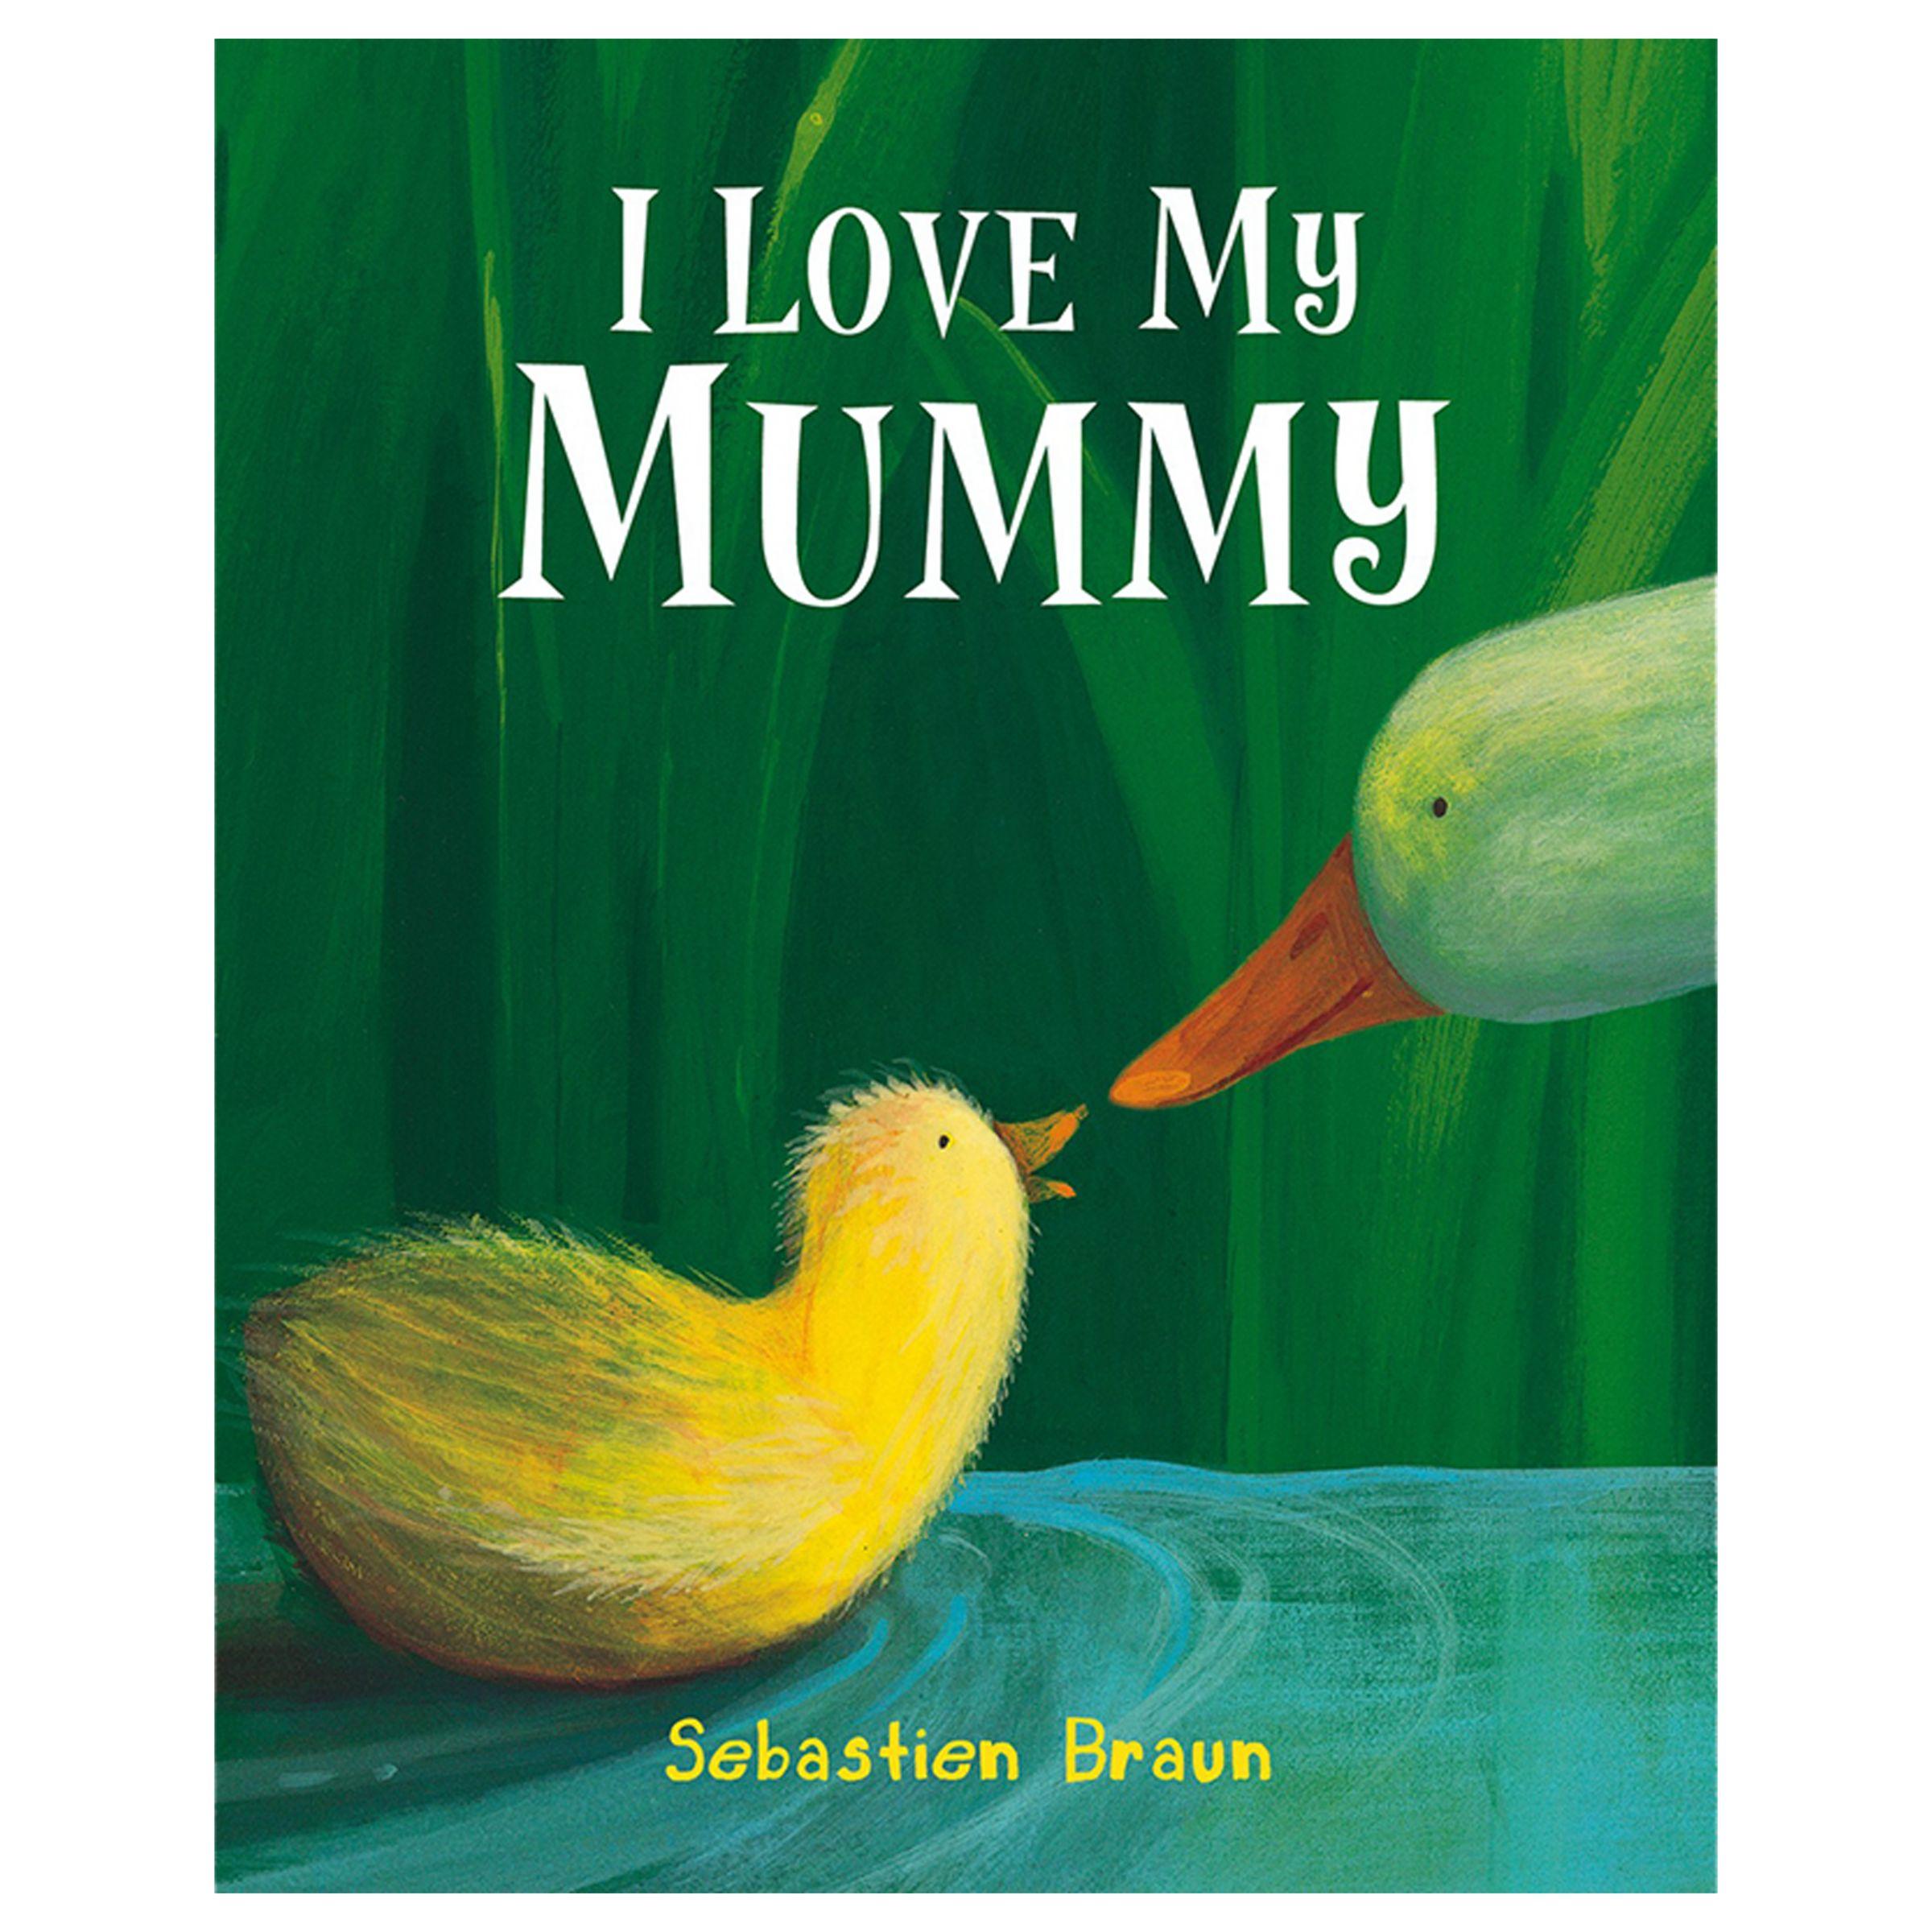 Children's Books I Love My Mummy Children's Book